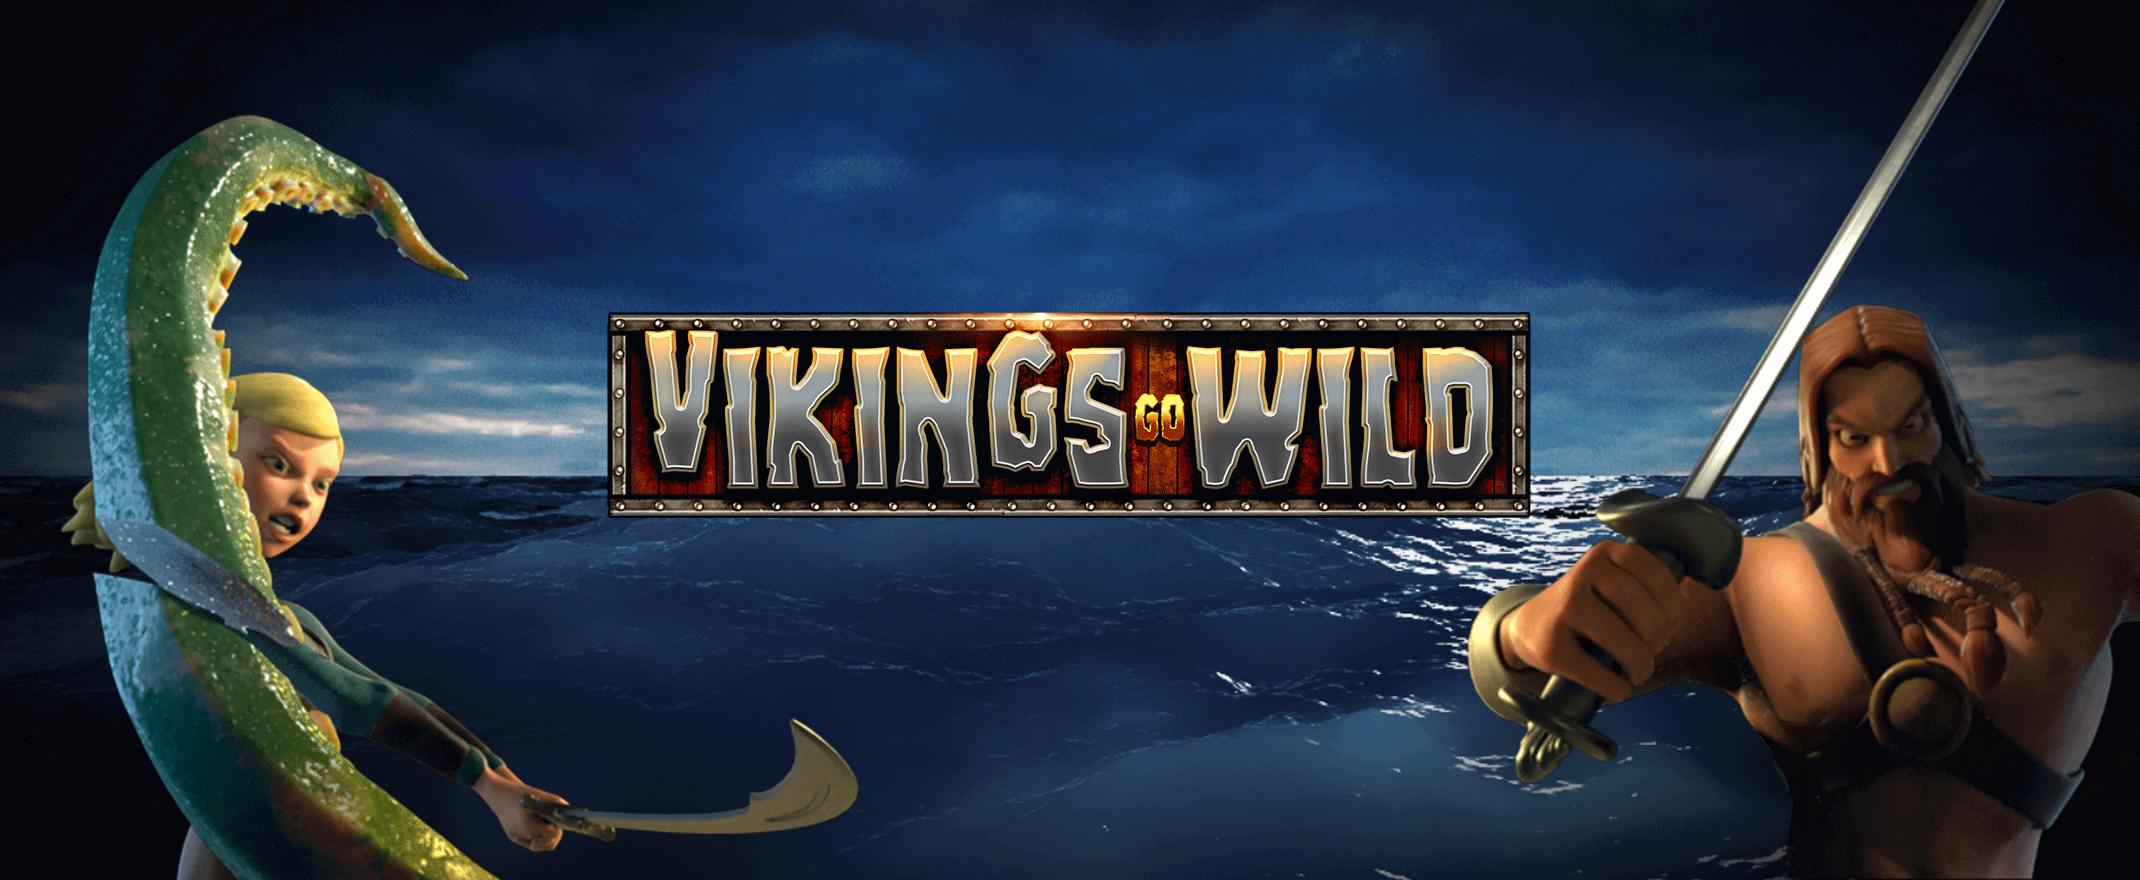 Vikings Go Wild Review